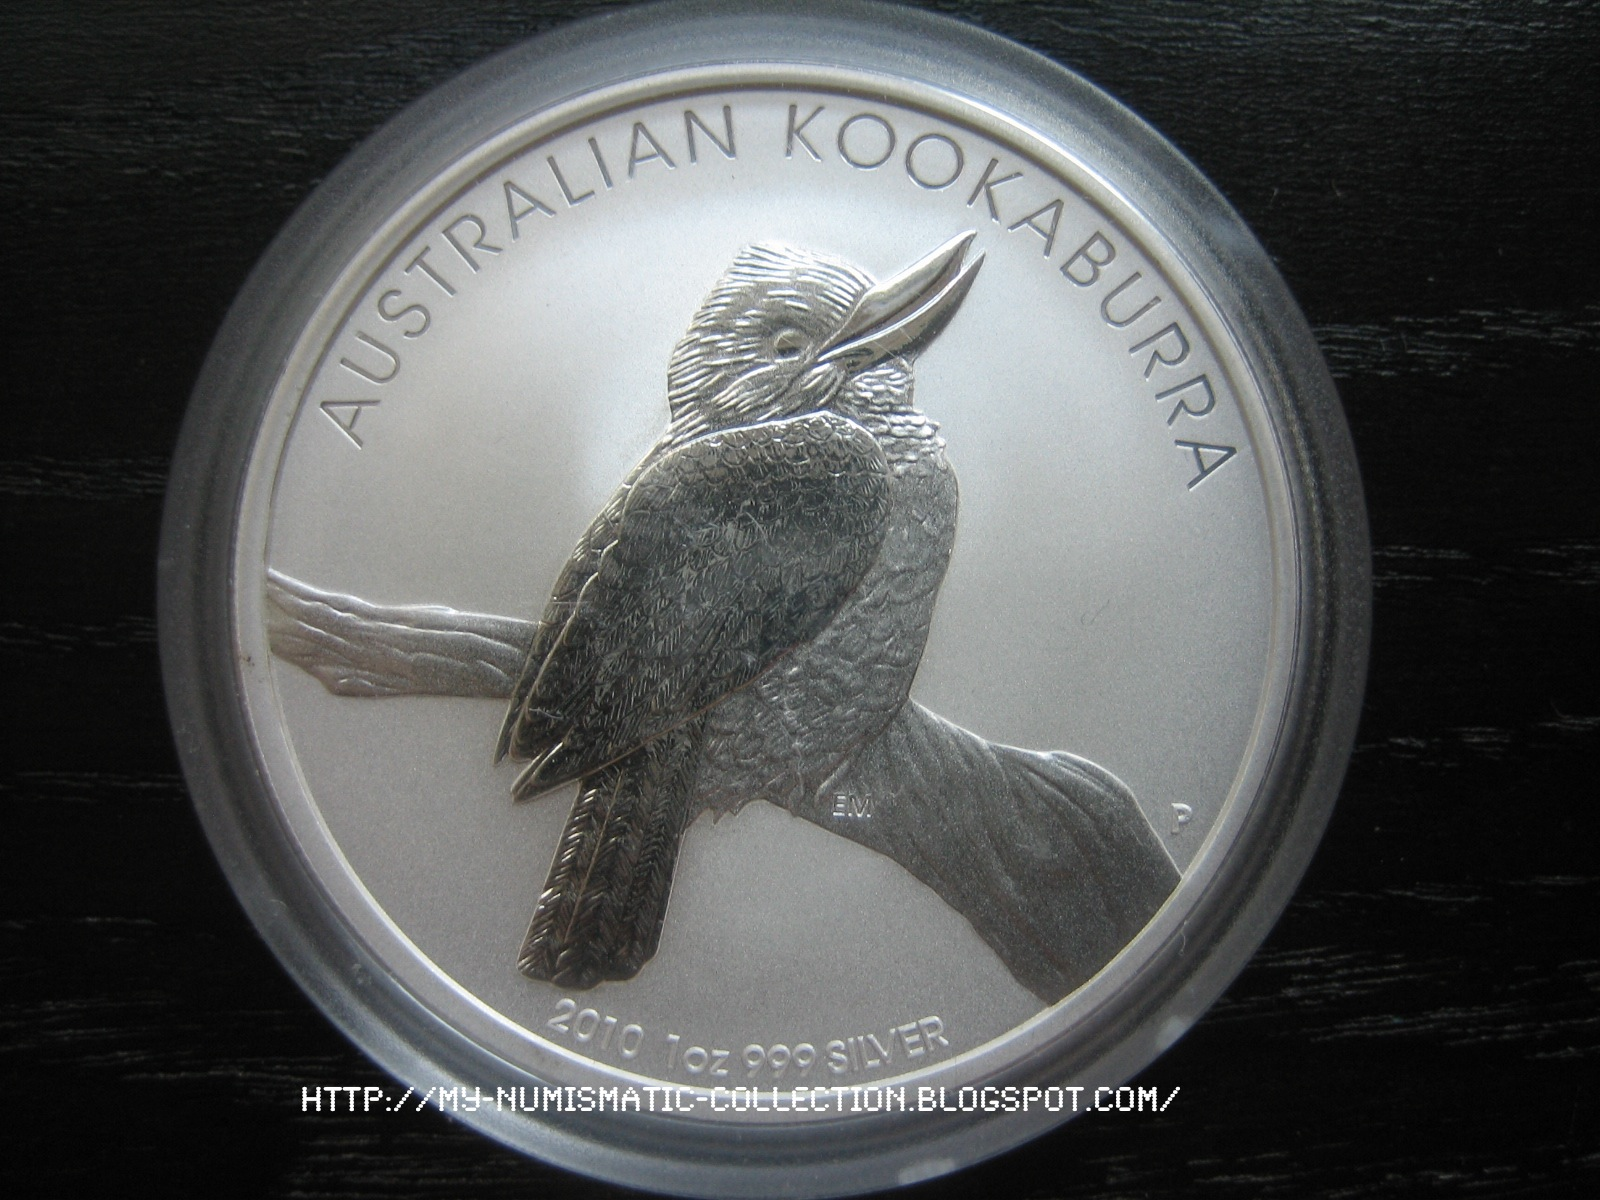 PM capsule round 1 oz BU-ST Silver with 2008 Australian Kookaburra